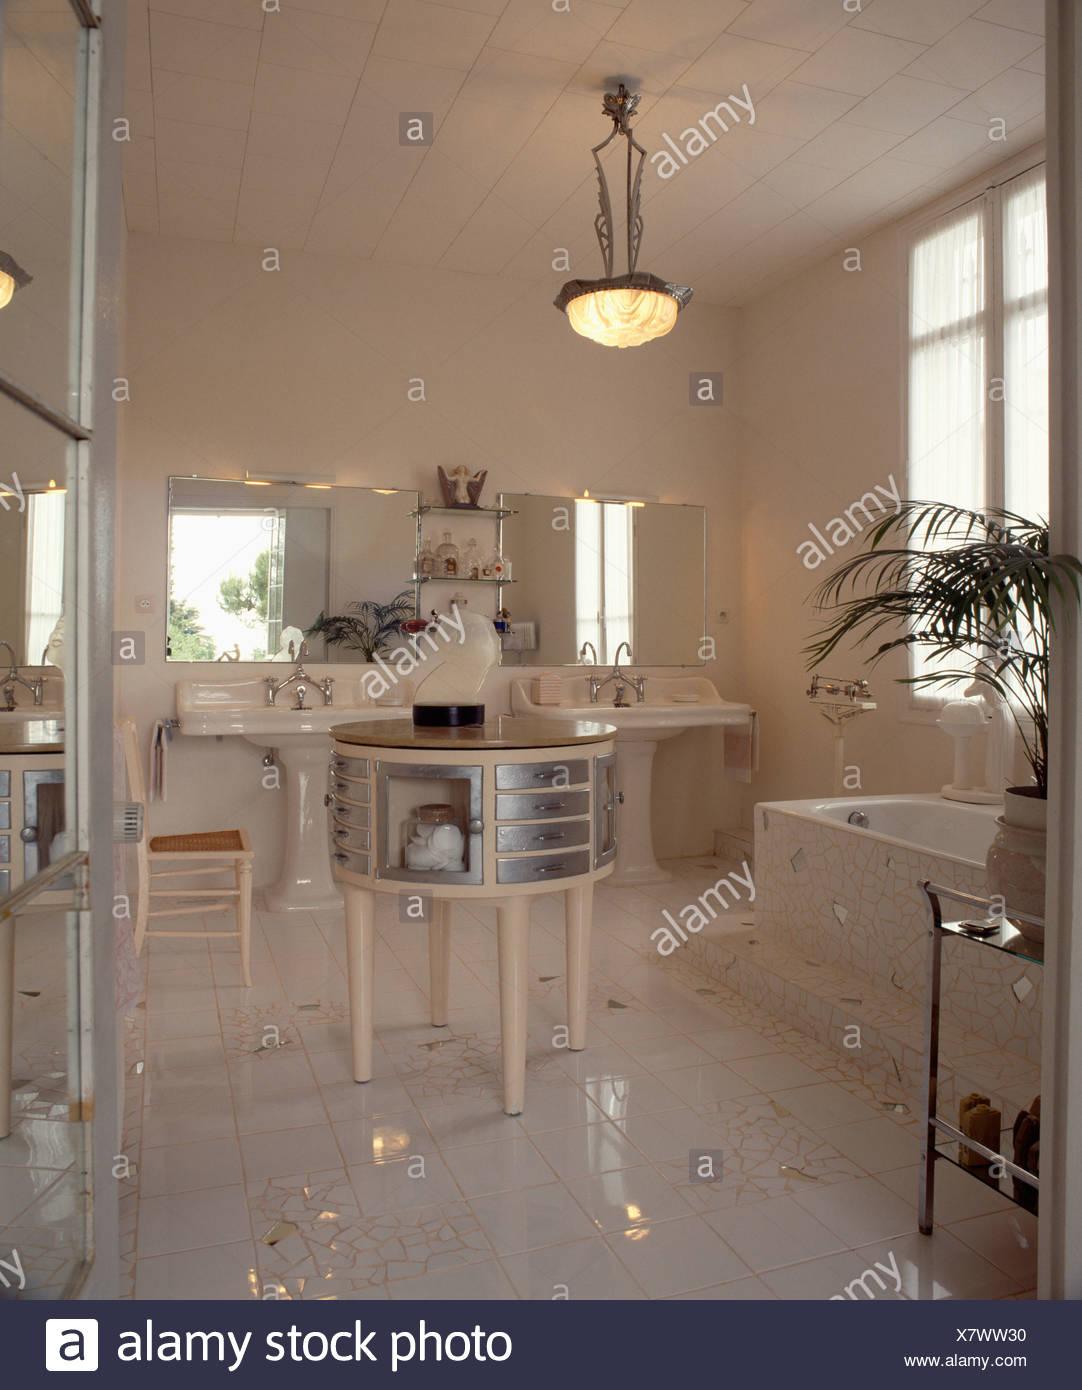 Deco Miroir Salle De Bain | Miroirs Tlmy Nordique Mur Rond Miroir ...